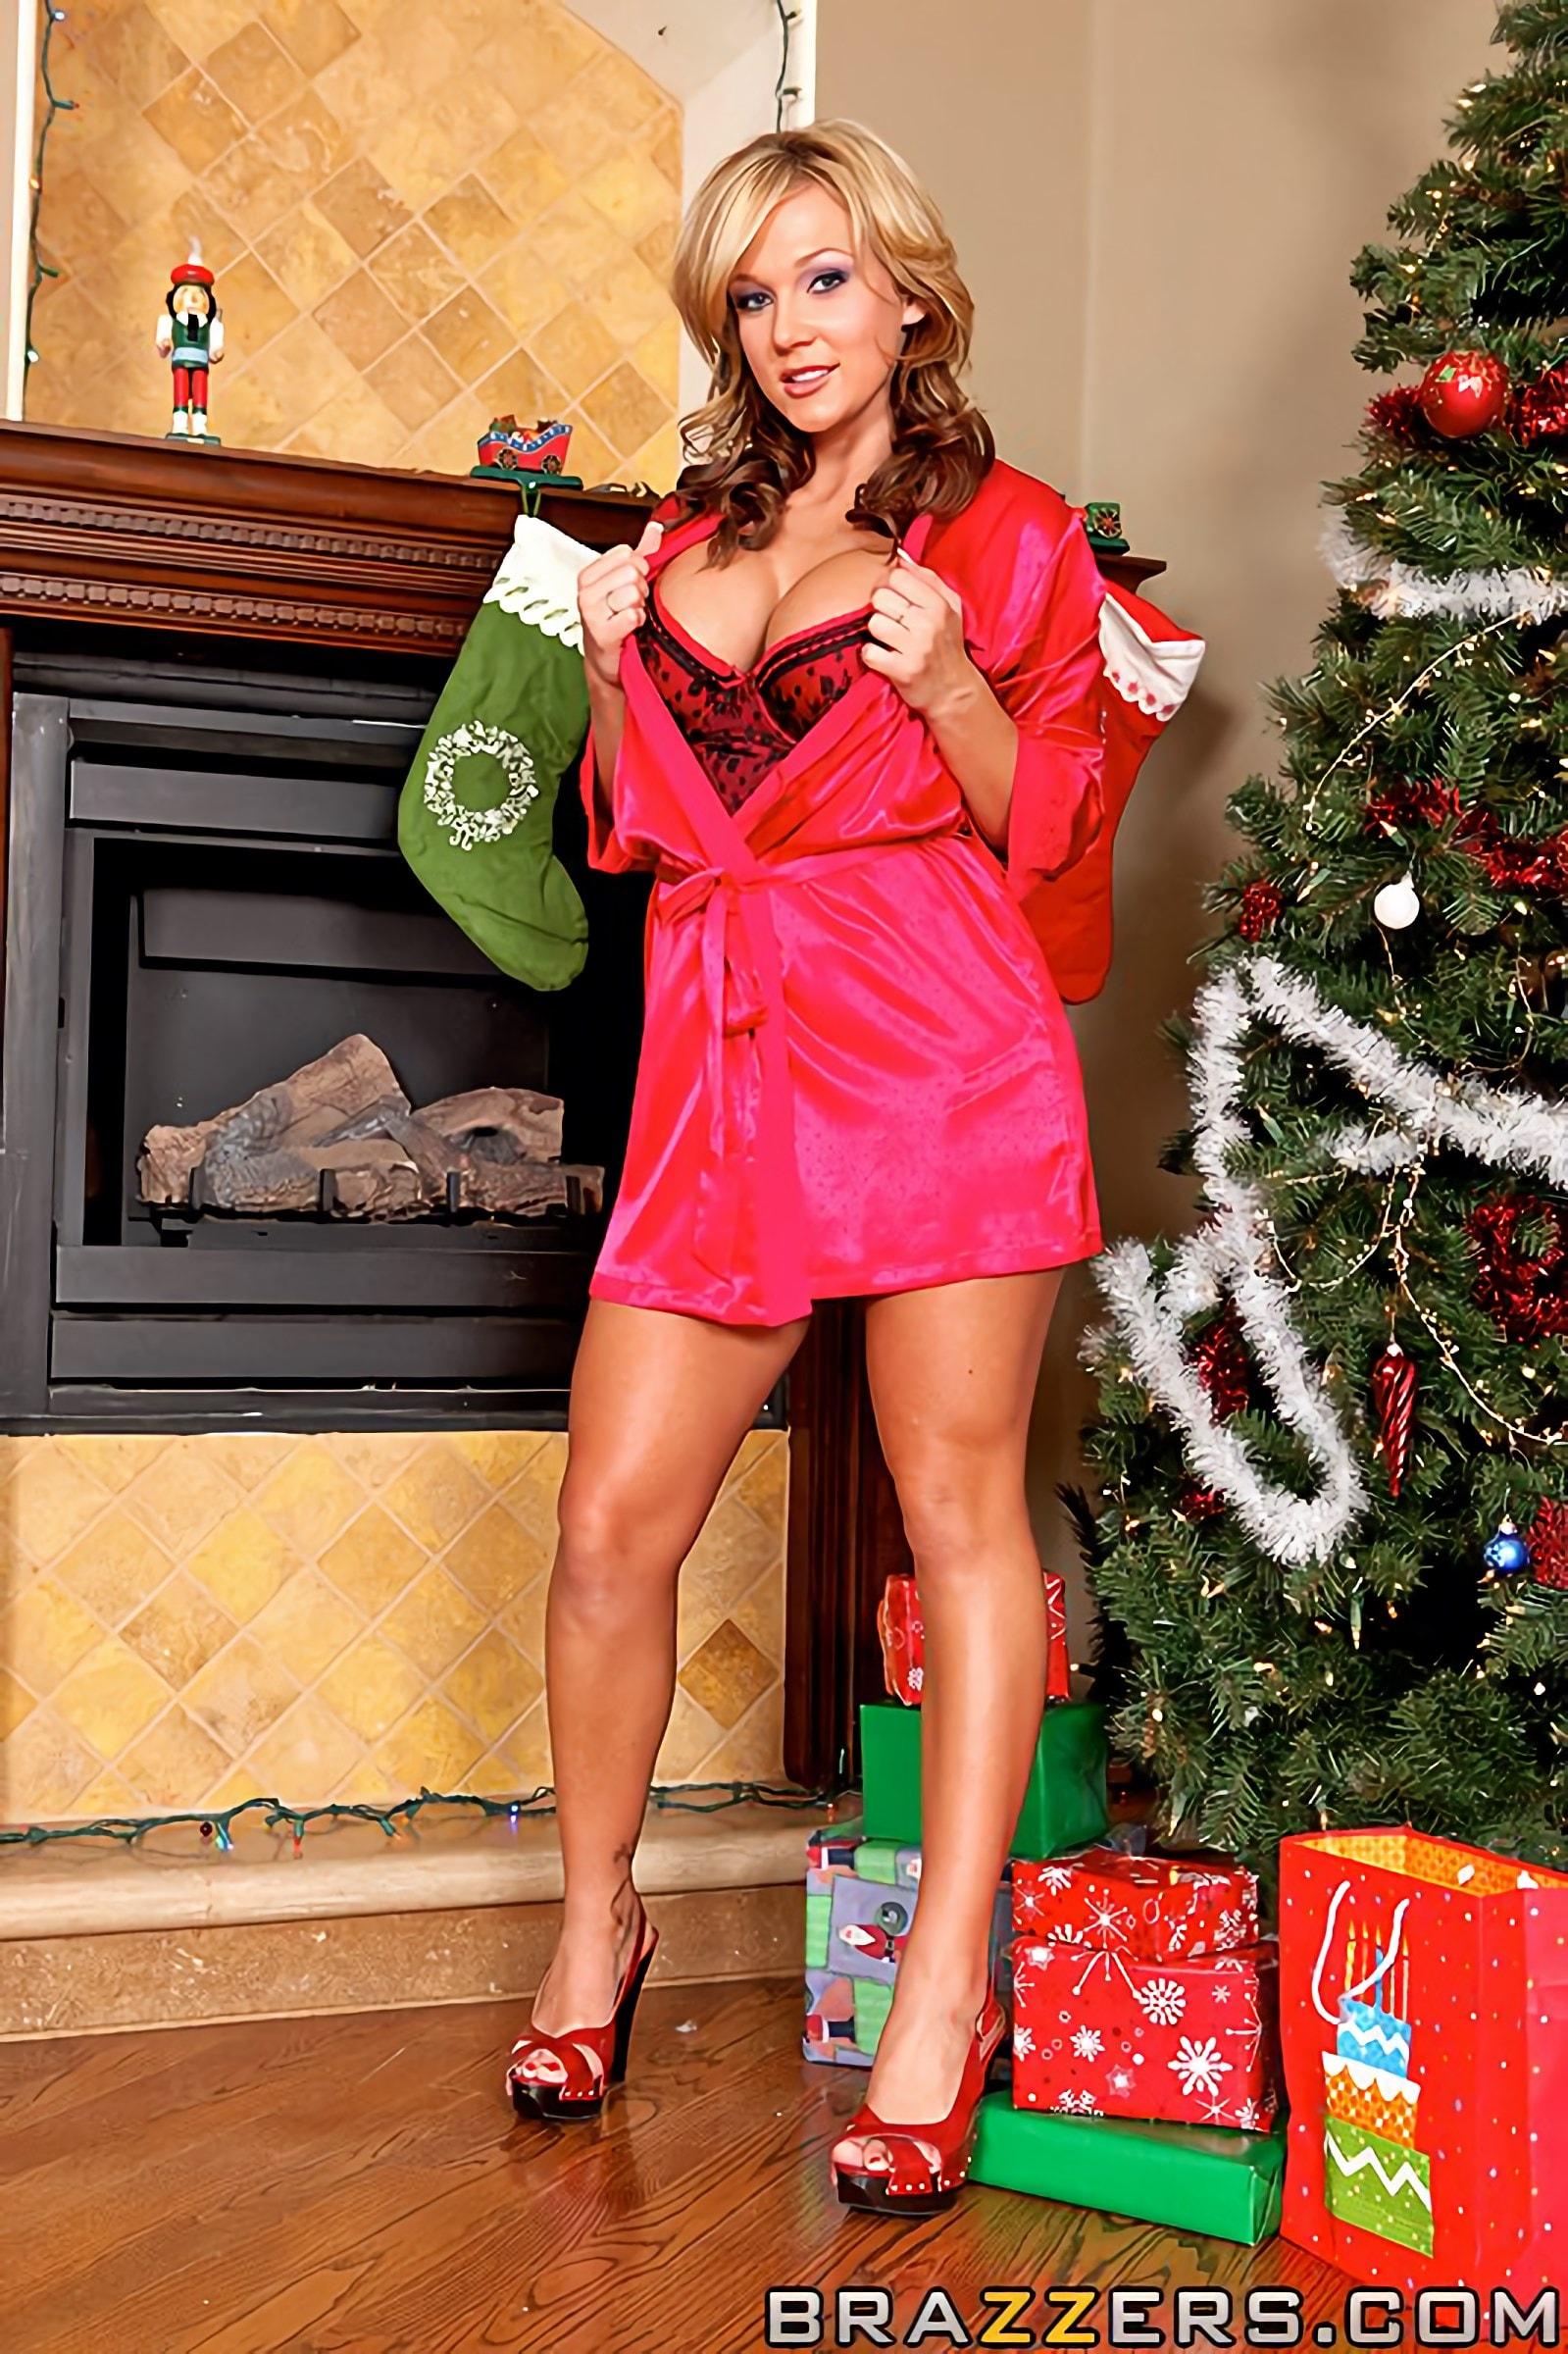 Brazzers 'Milk and Boobies' starring Nikki Sexx (Photo 1)